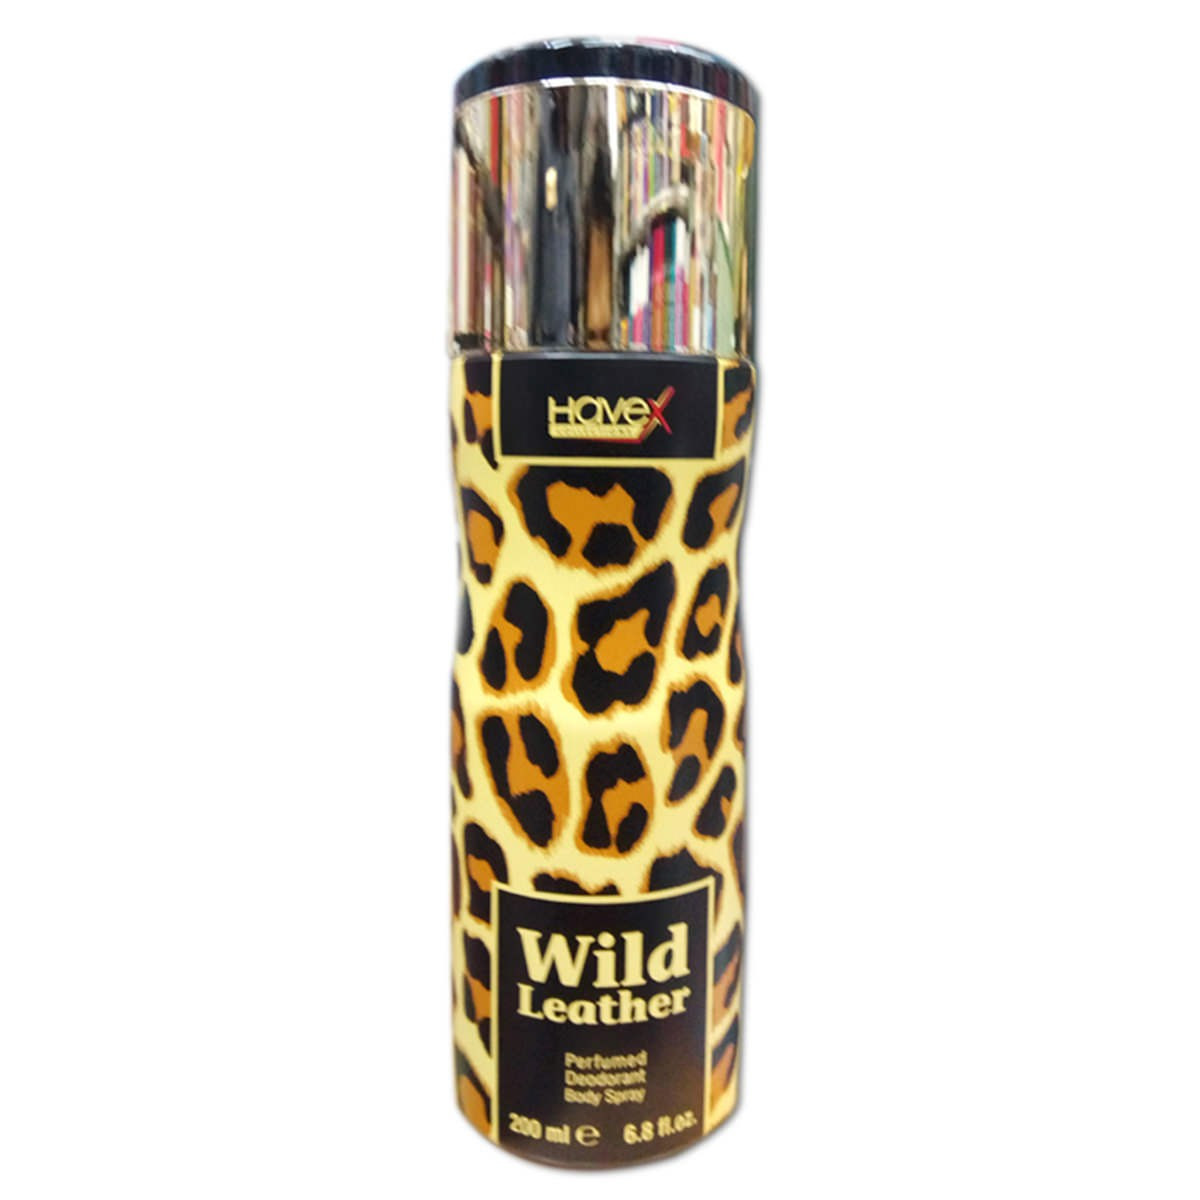 Havex Wild Leather Body Spray 200ml